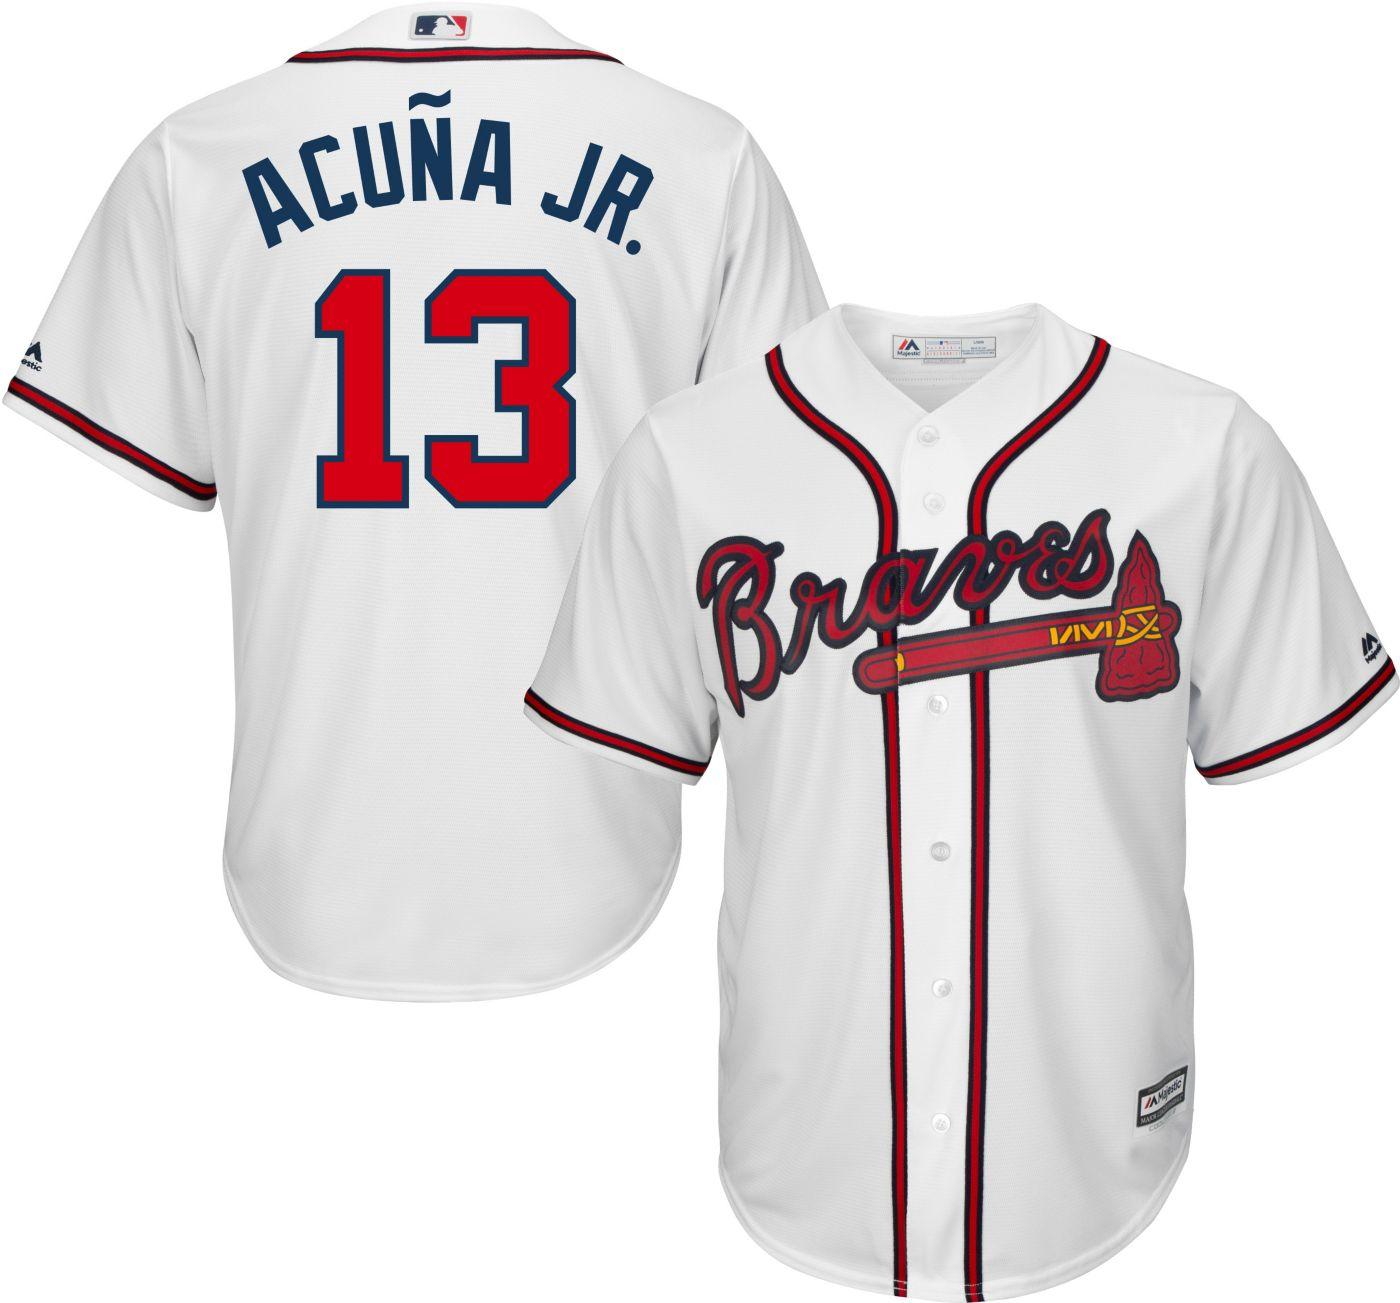 Youth Replica Atlanta Braves Ronald Acuña #13 Home White Jersey